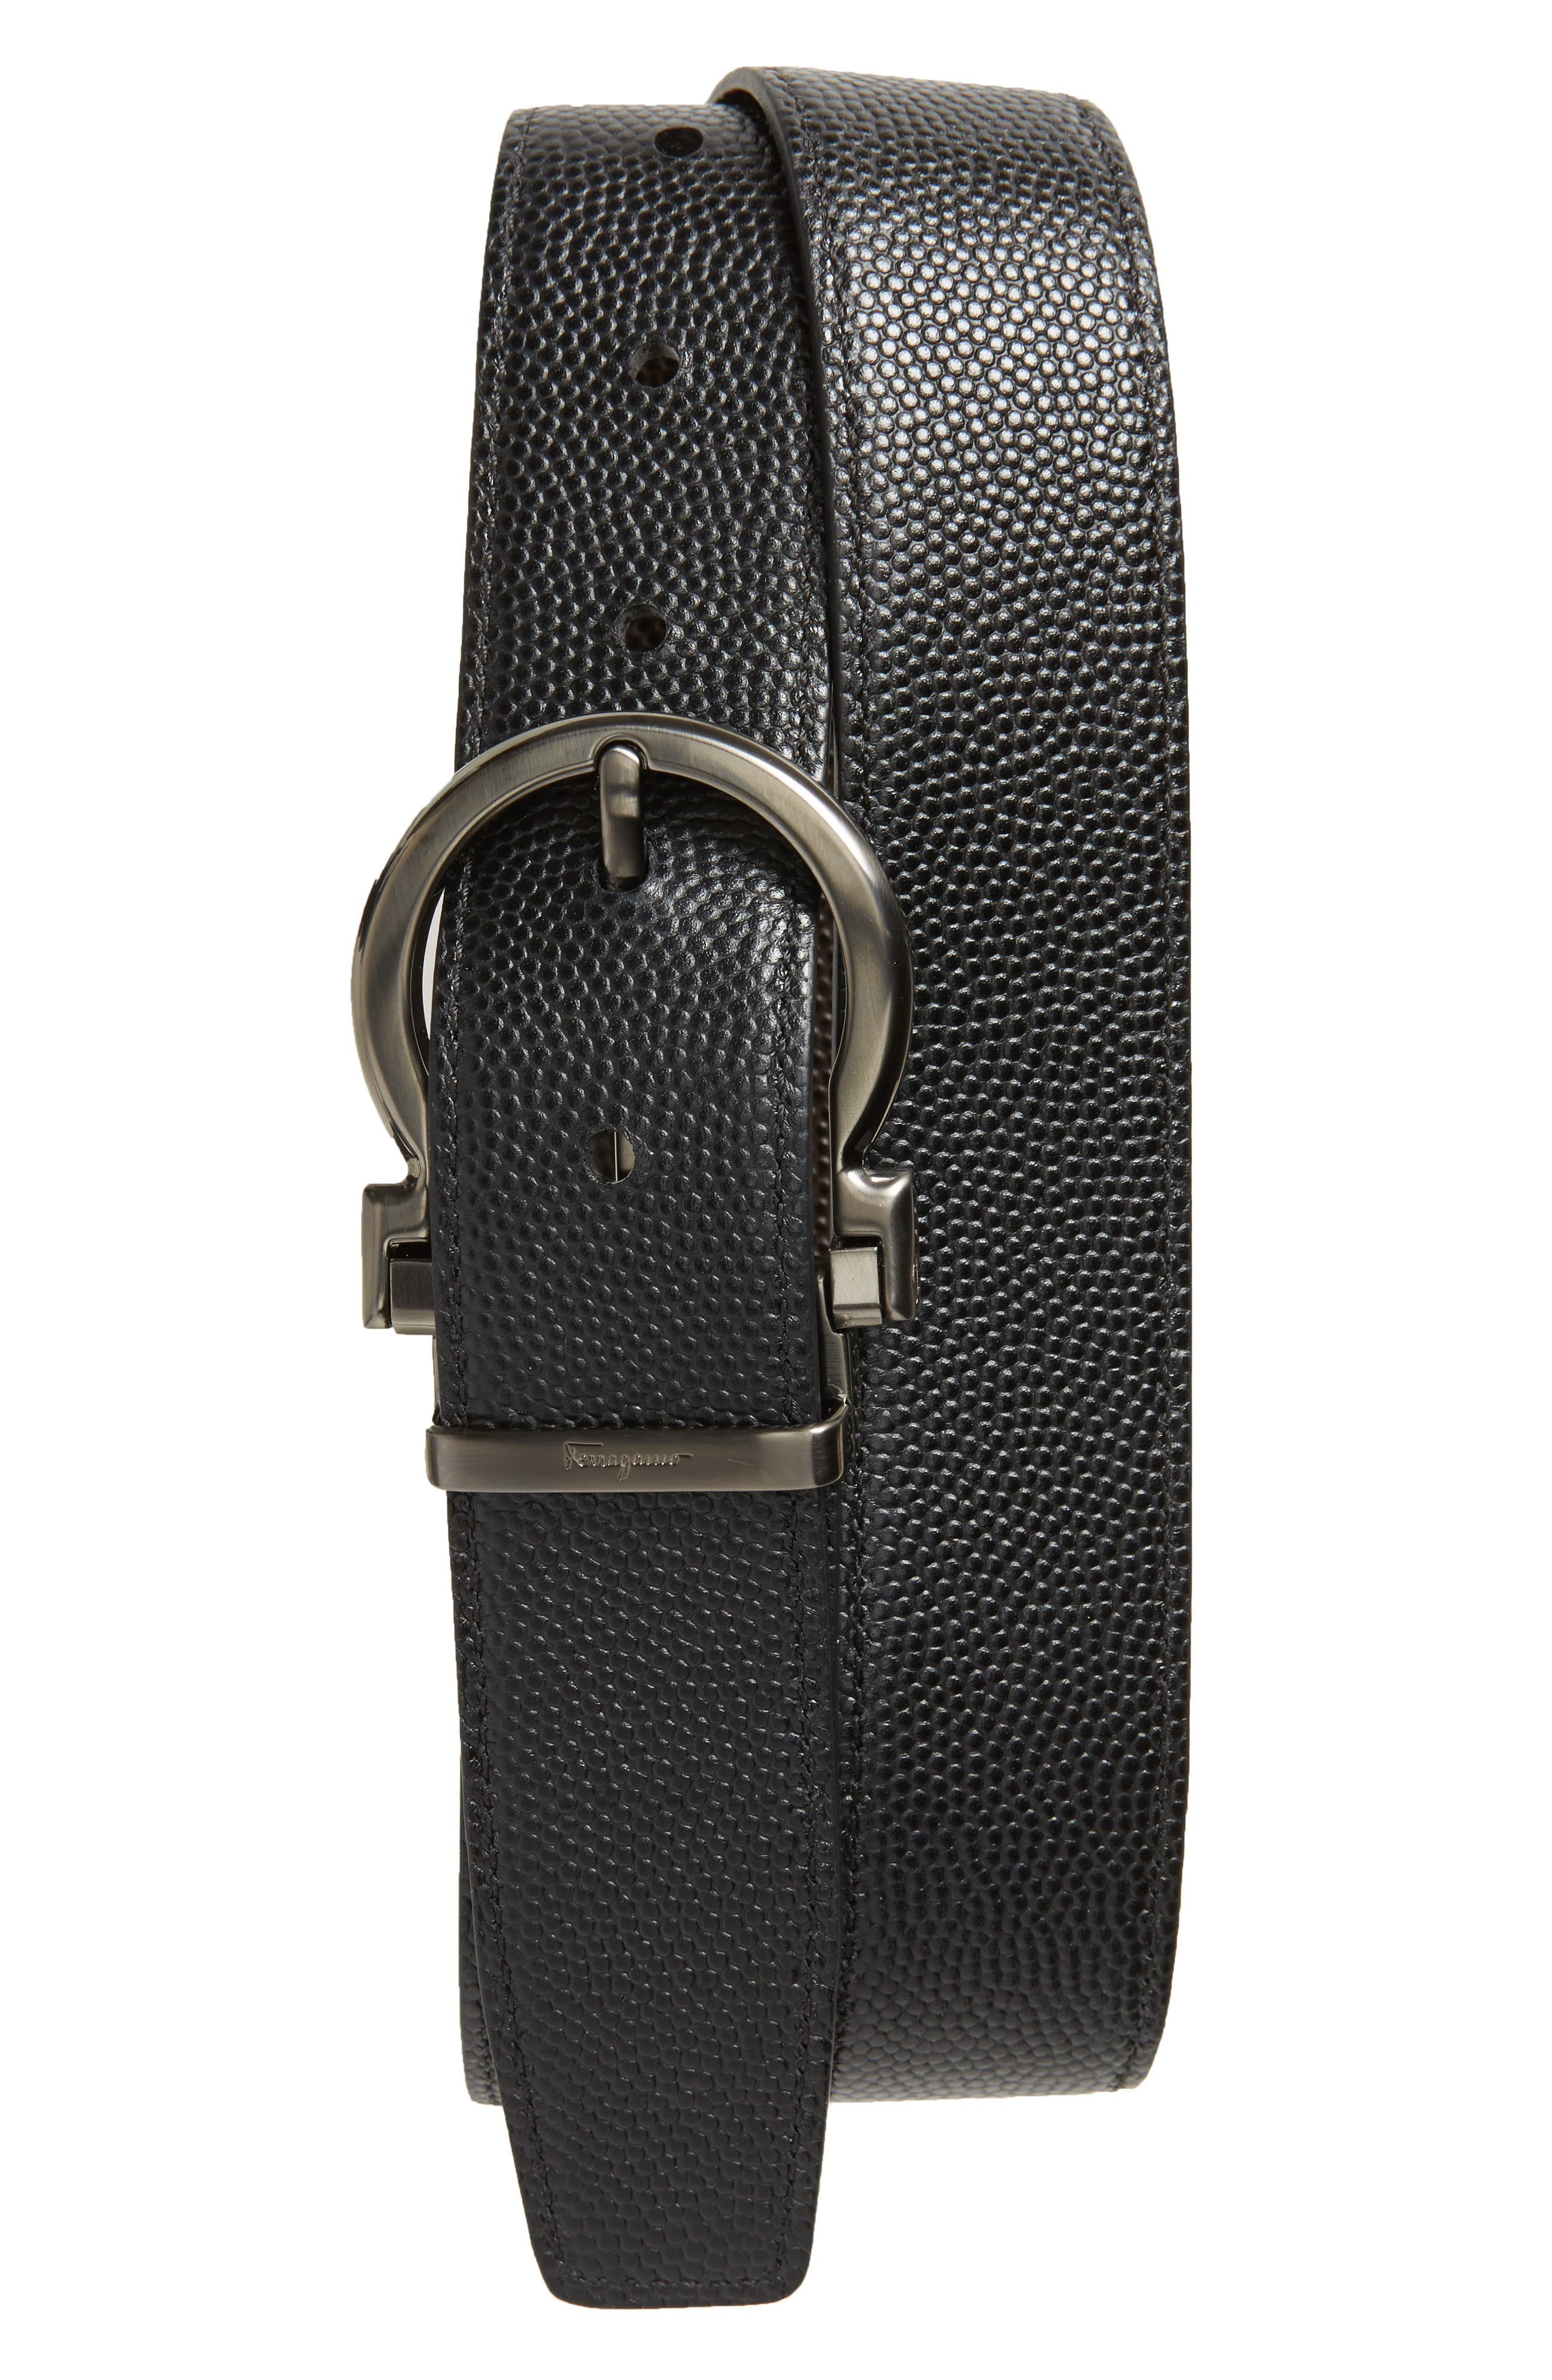 SALVATORE FERRAGAMO, Salvatore Ferragaom Reversible Leather Belt, Alternate thumbnail 2, color, CHOCOLATE/ BLACK